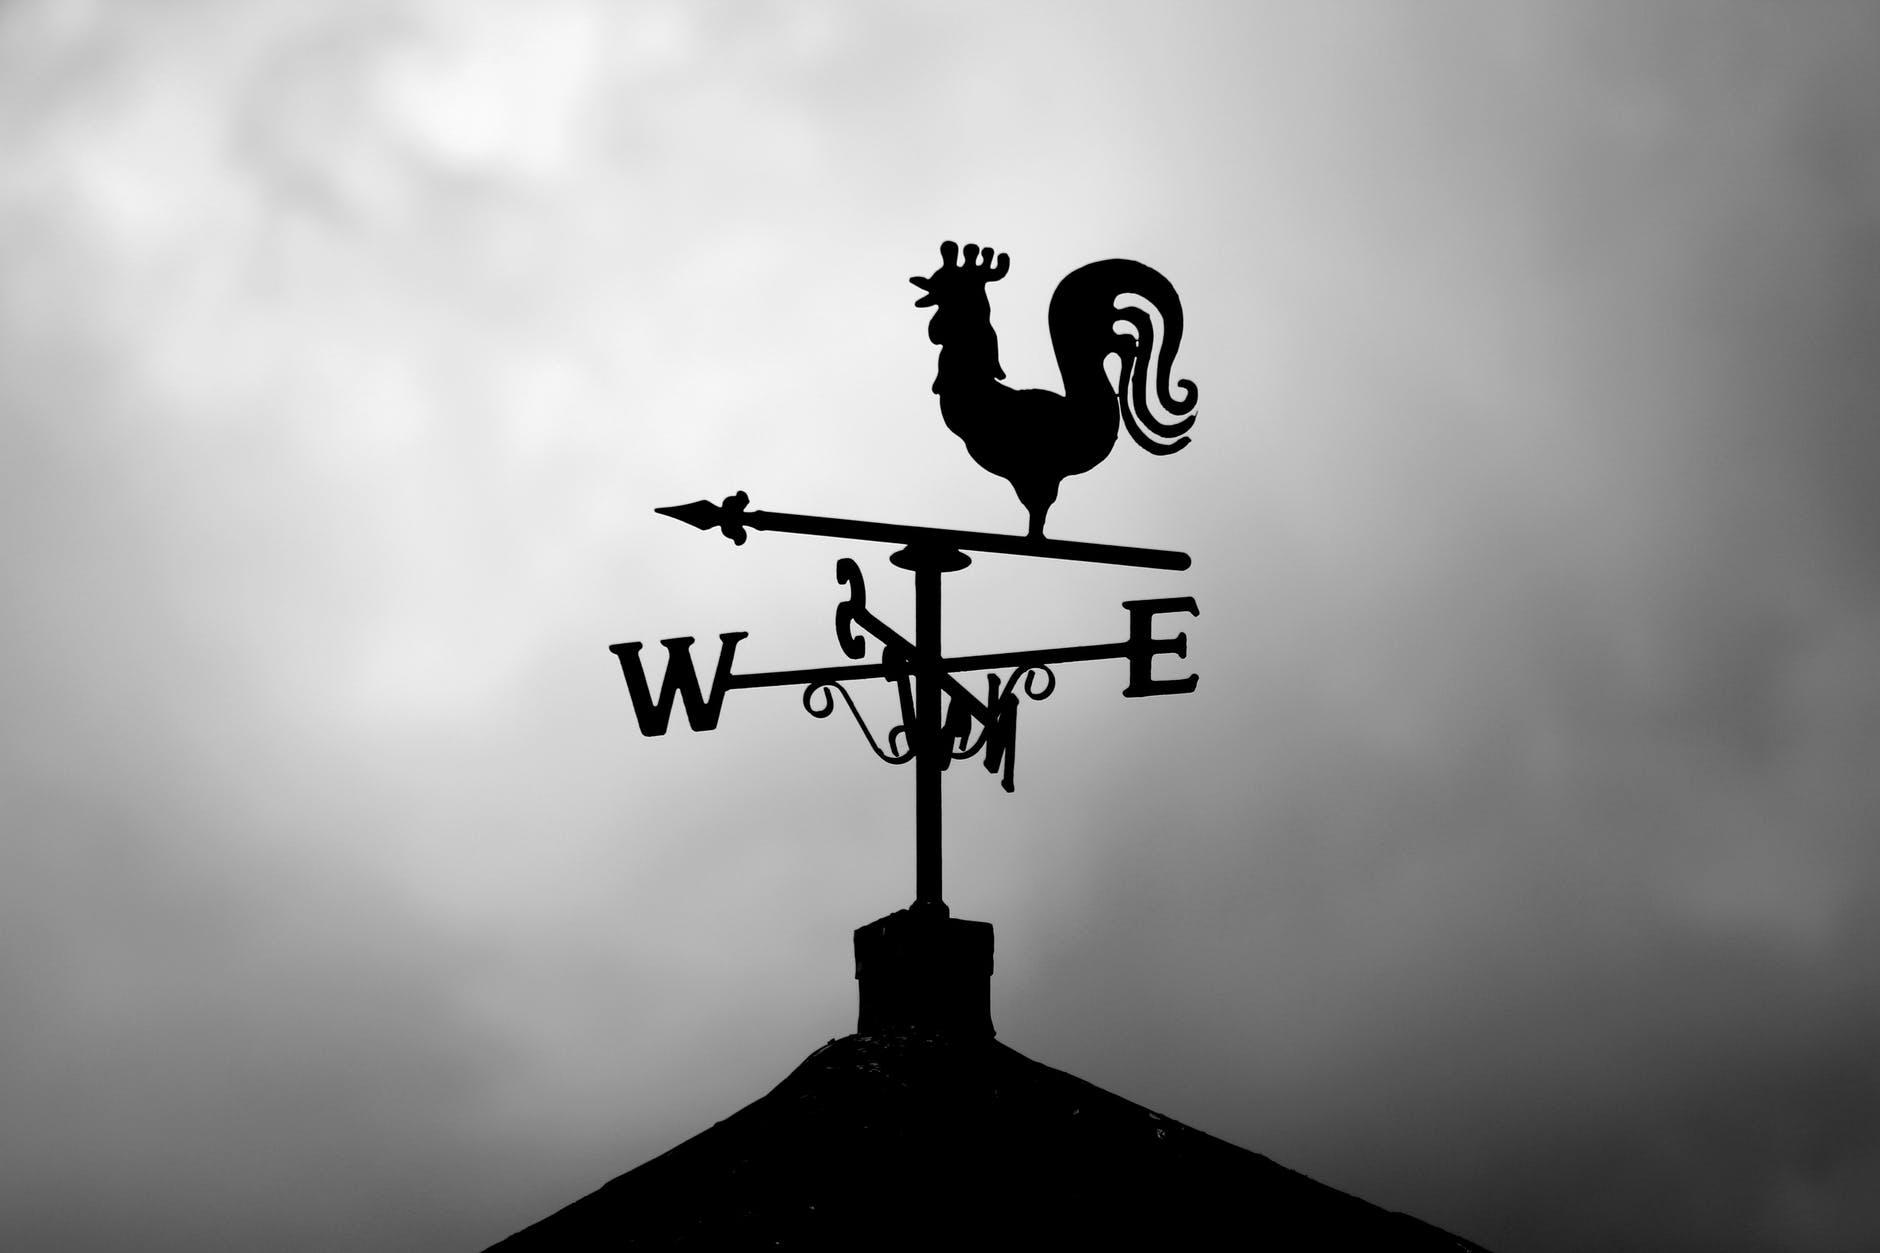 silhouette of wind vane